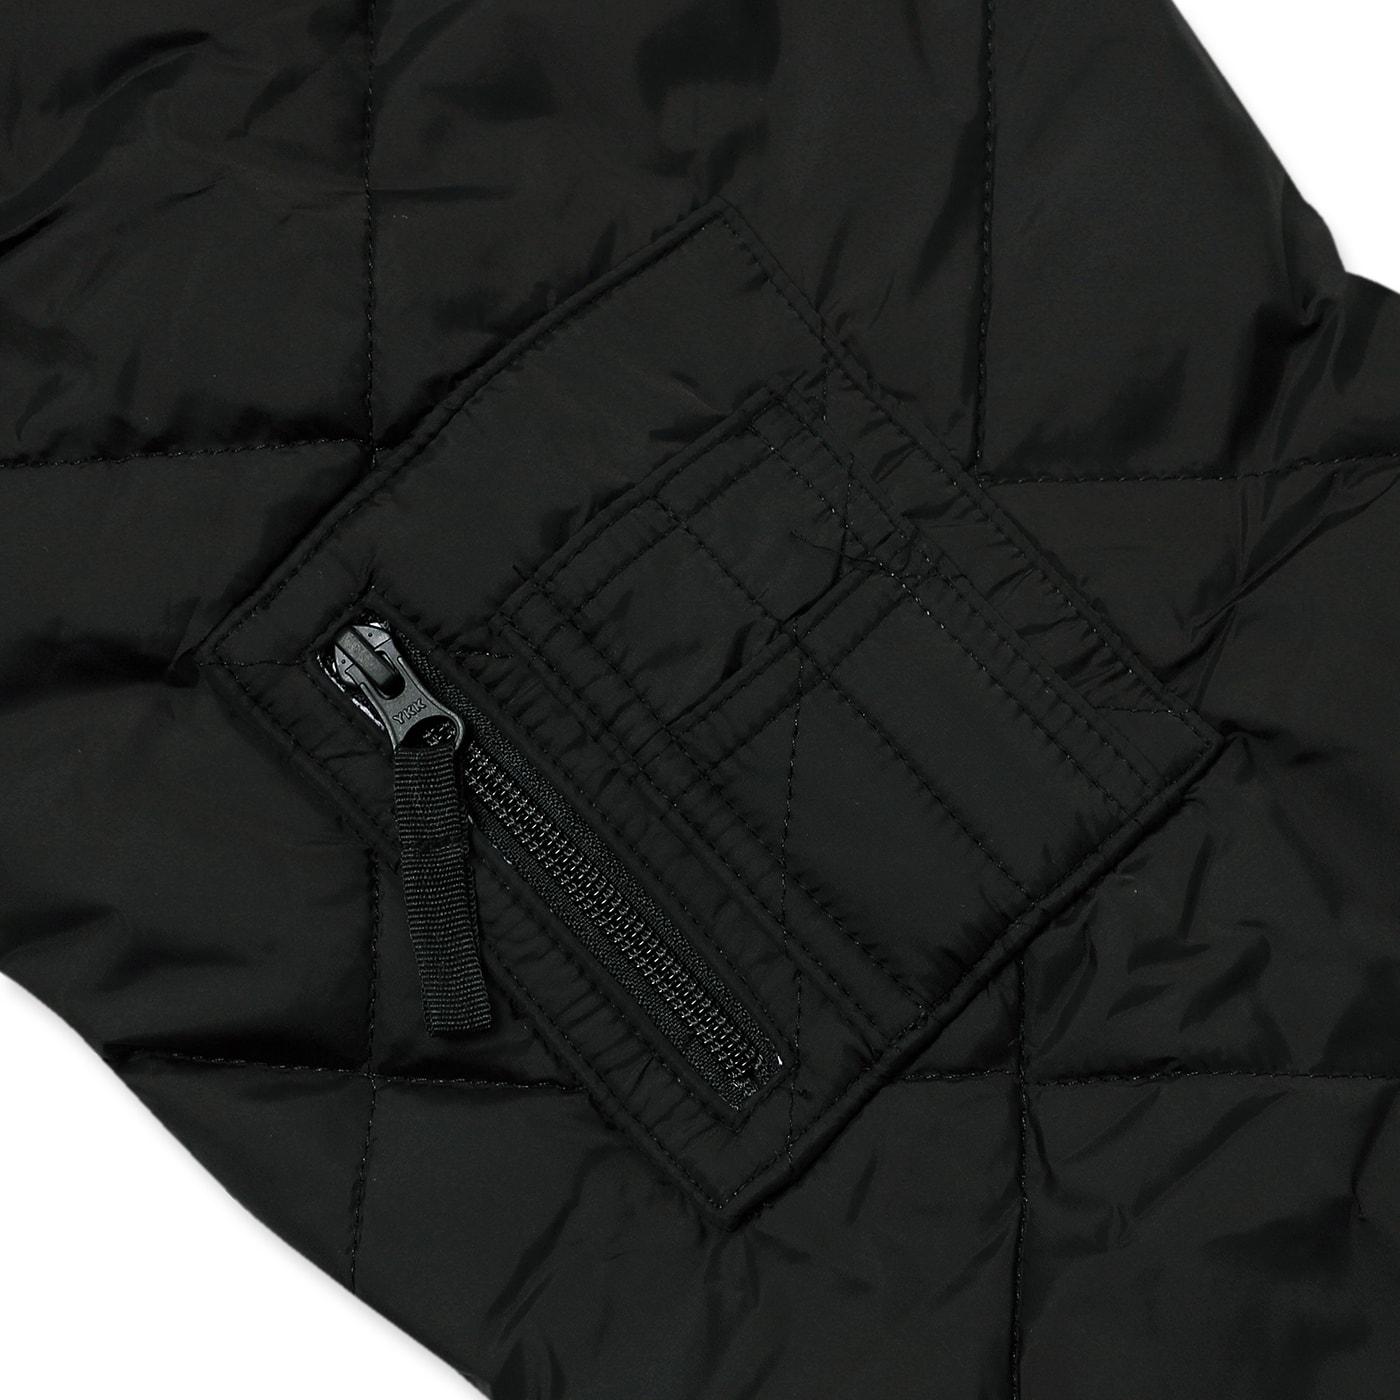 Arch stencil flight jacket